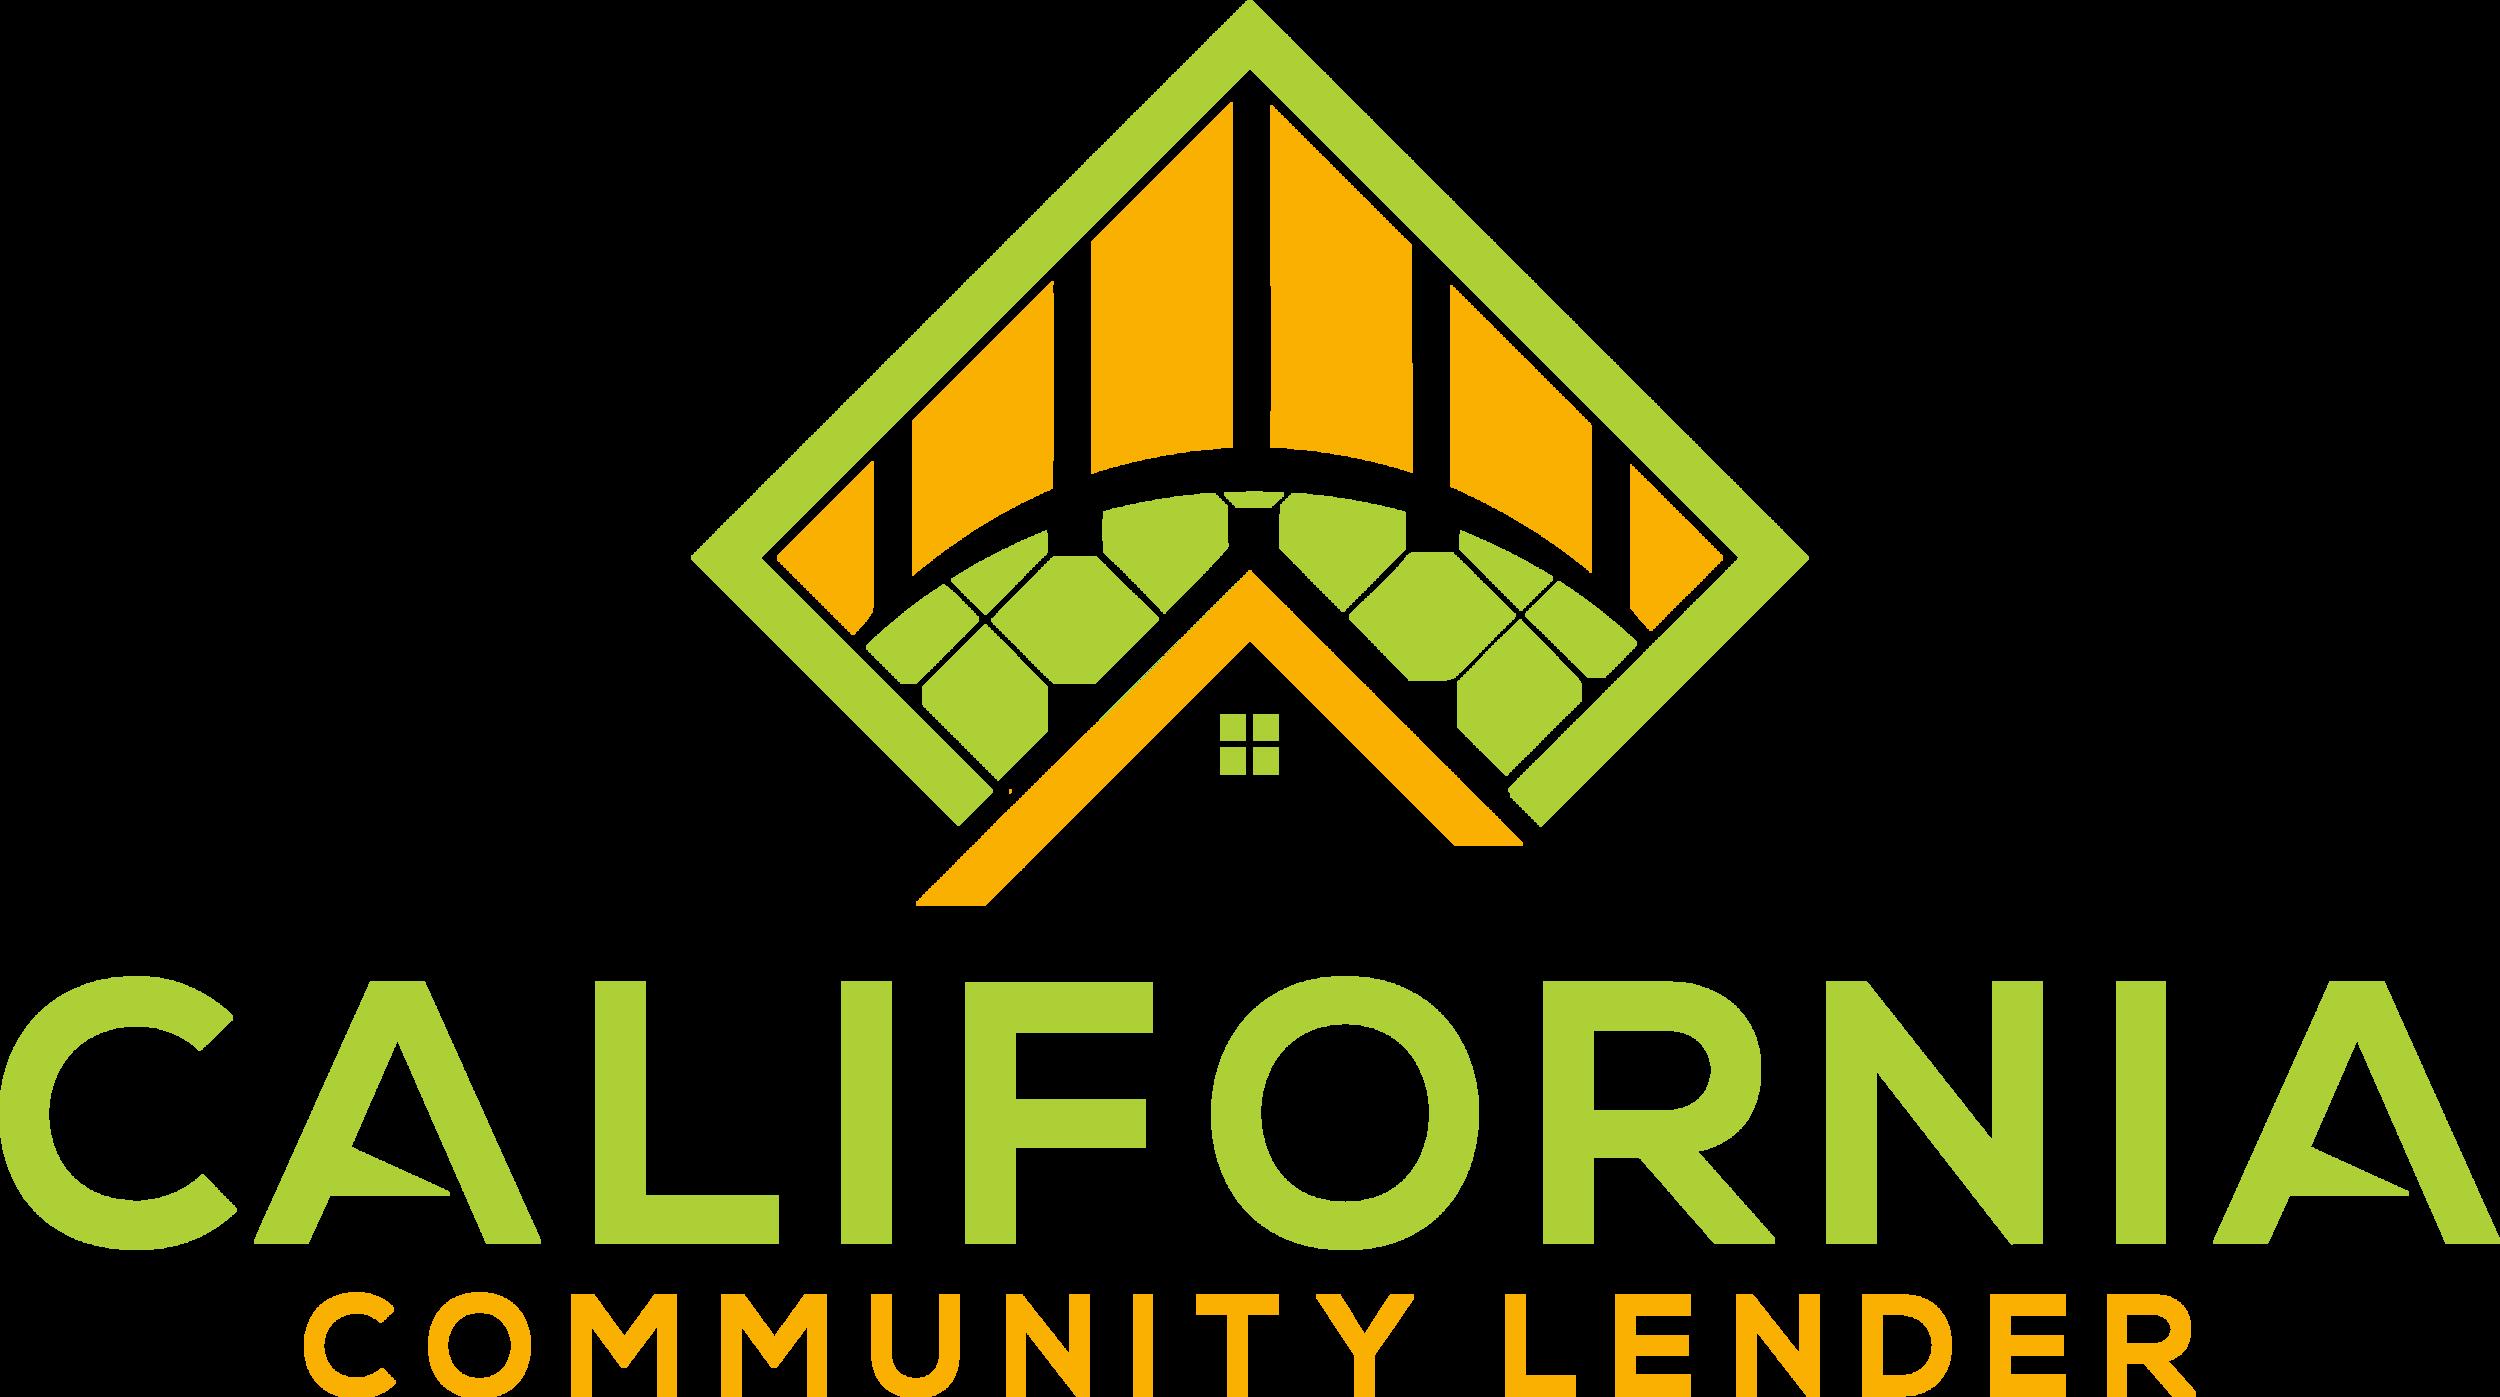 California Community Lender.png